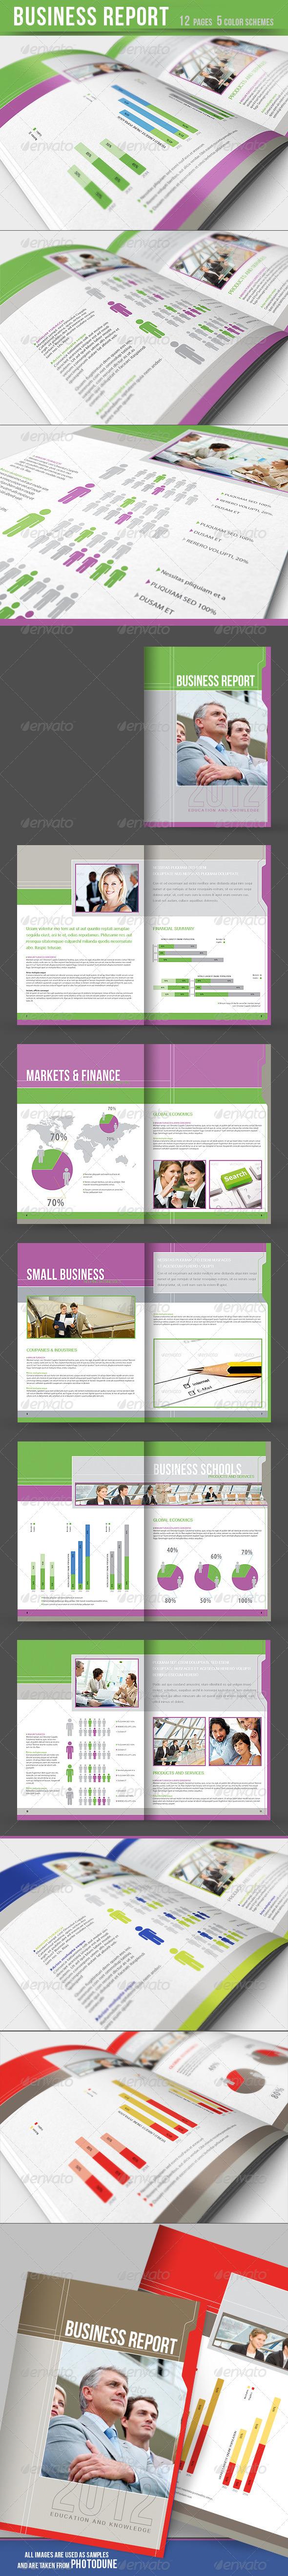 GraphicRiver Business Report Brochure 5 color schemes 2231312